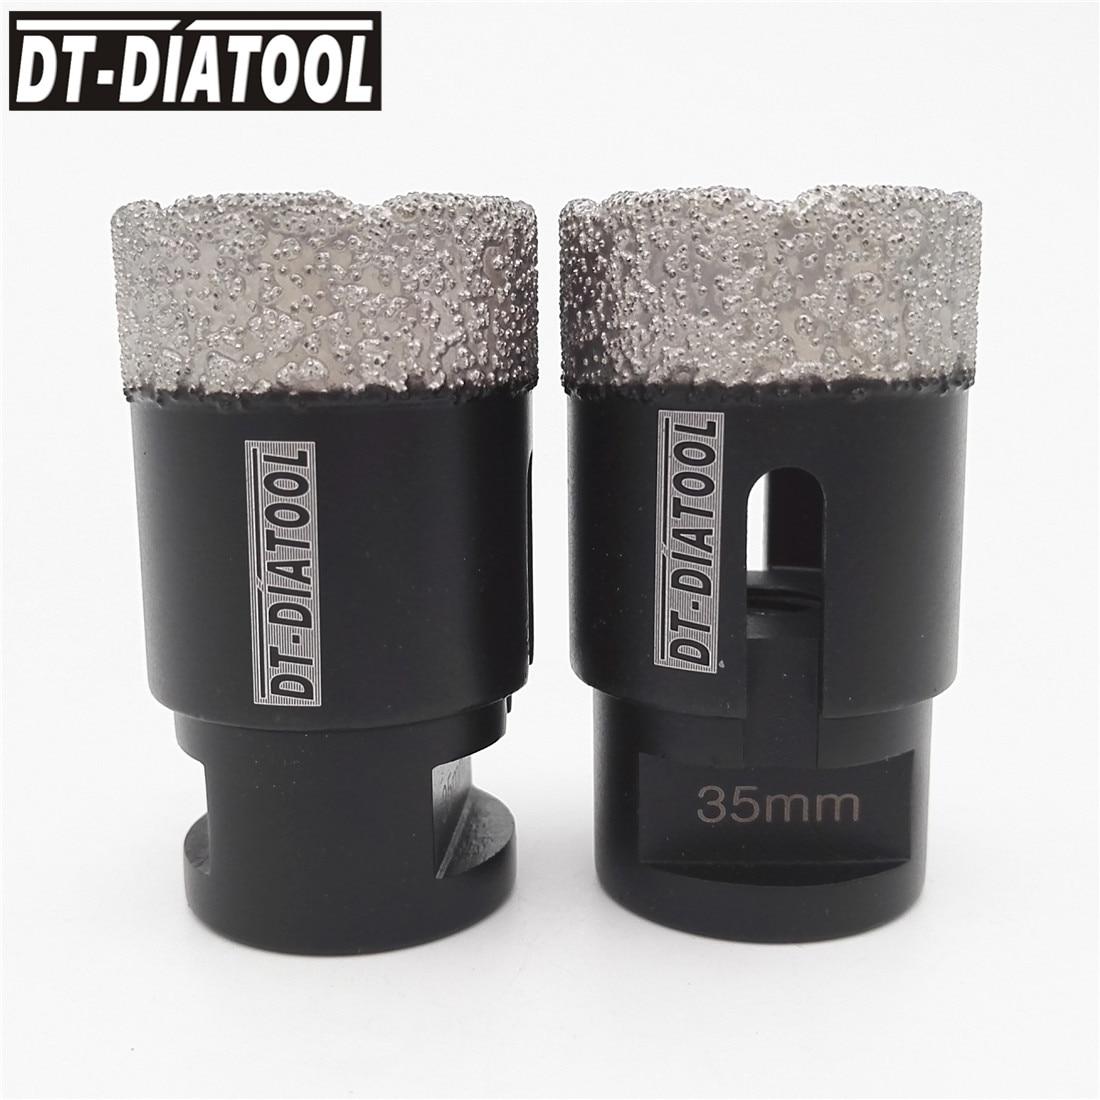 2pcs 35mm Dry Vacuum Brazed Diamond Drilling Core Bits Ceramic Tile Hole Saw M14 Professional Quality Drill bits